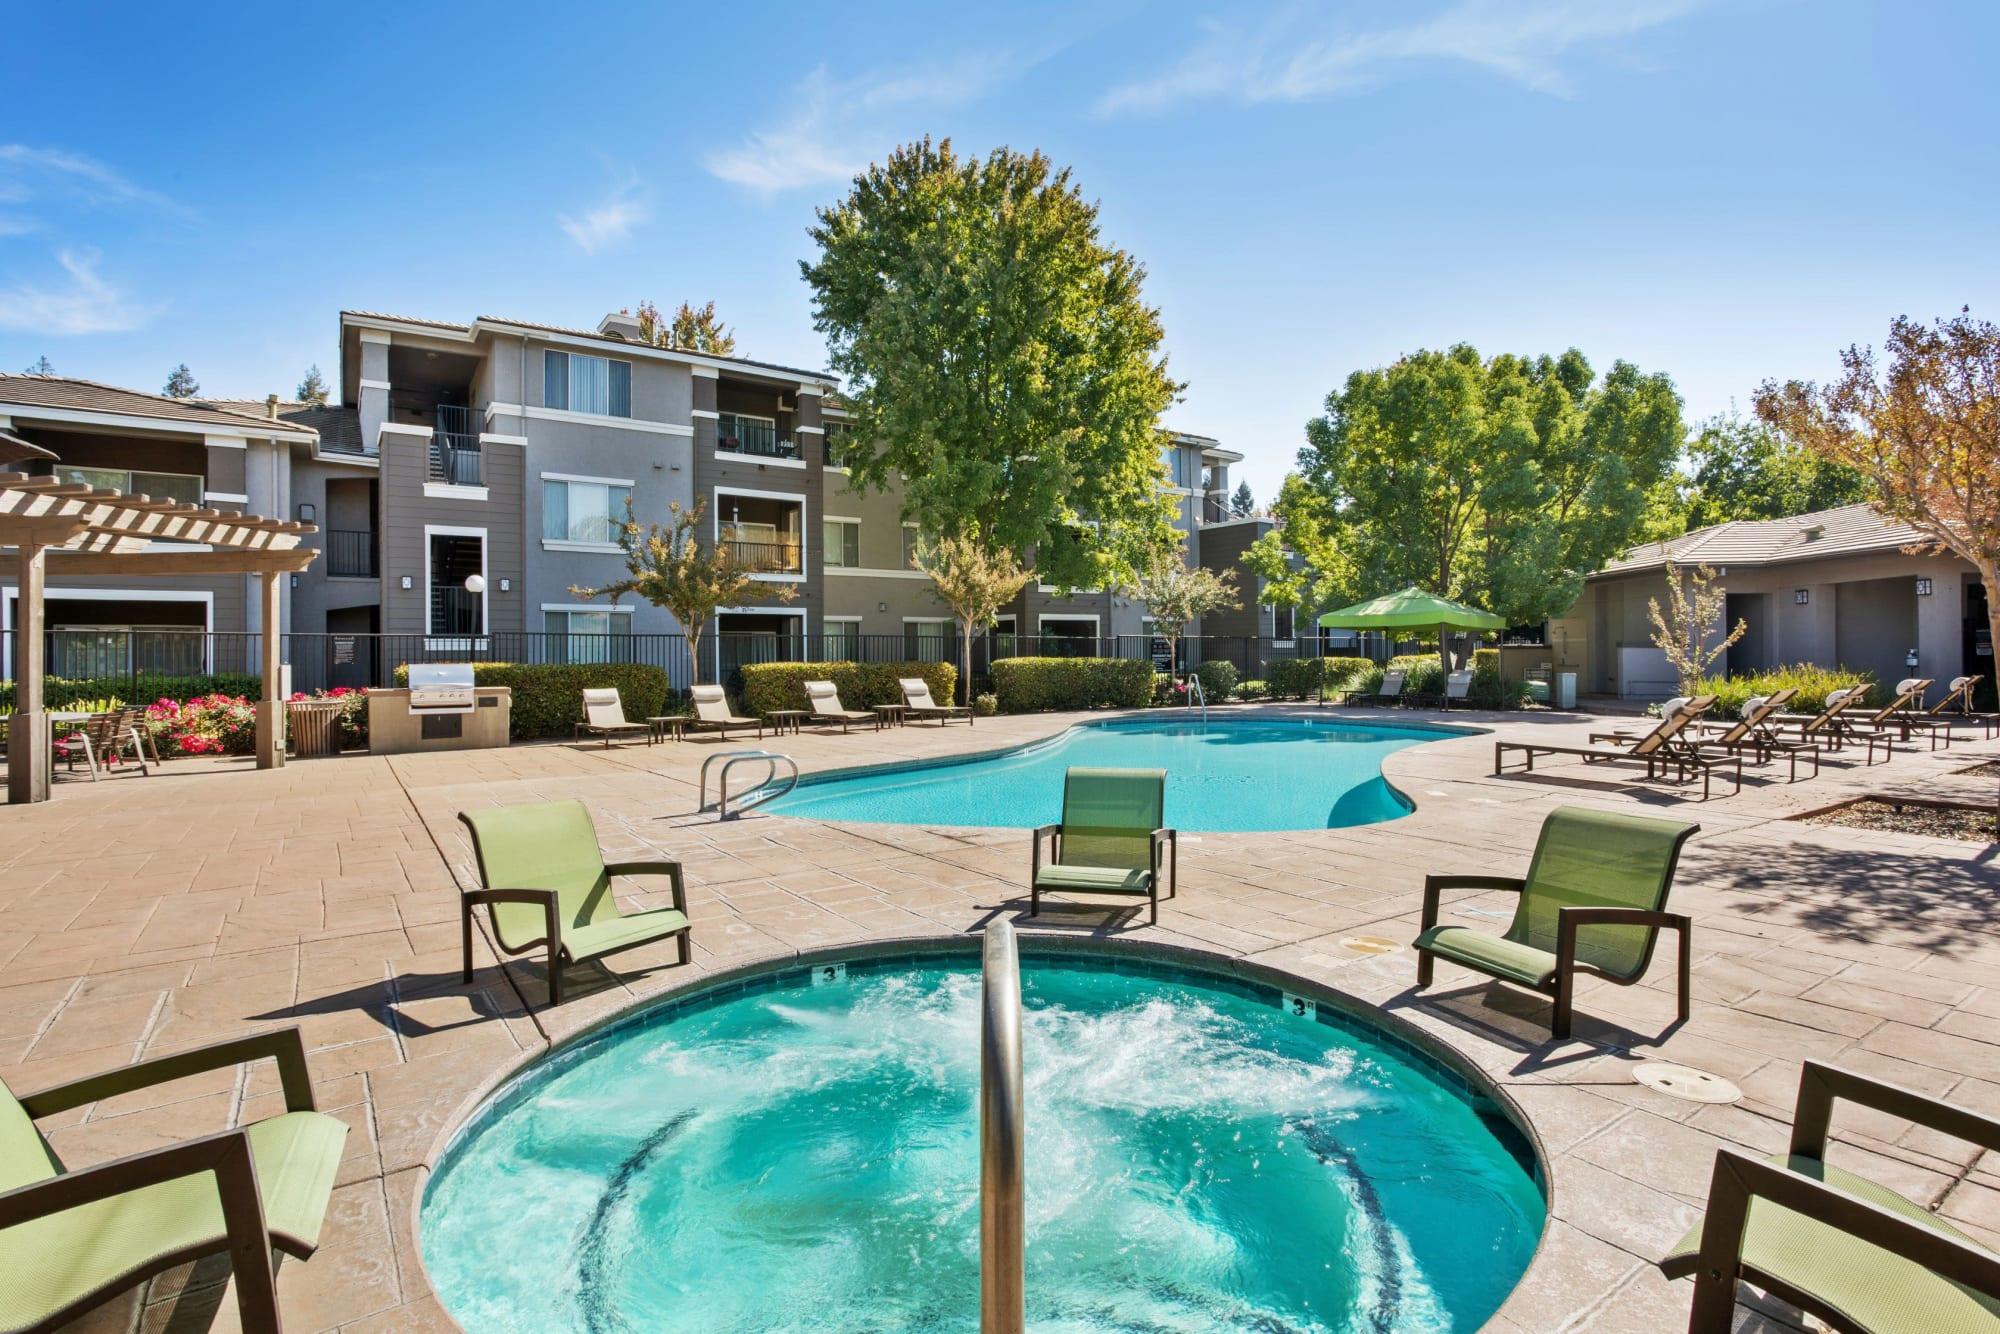 The outdoor swimming pool area at Miramonte and Trovas in Sacramento, California